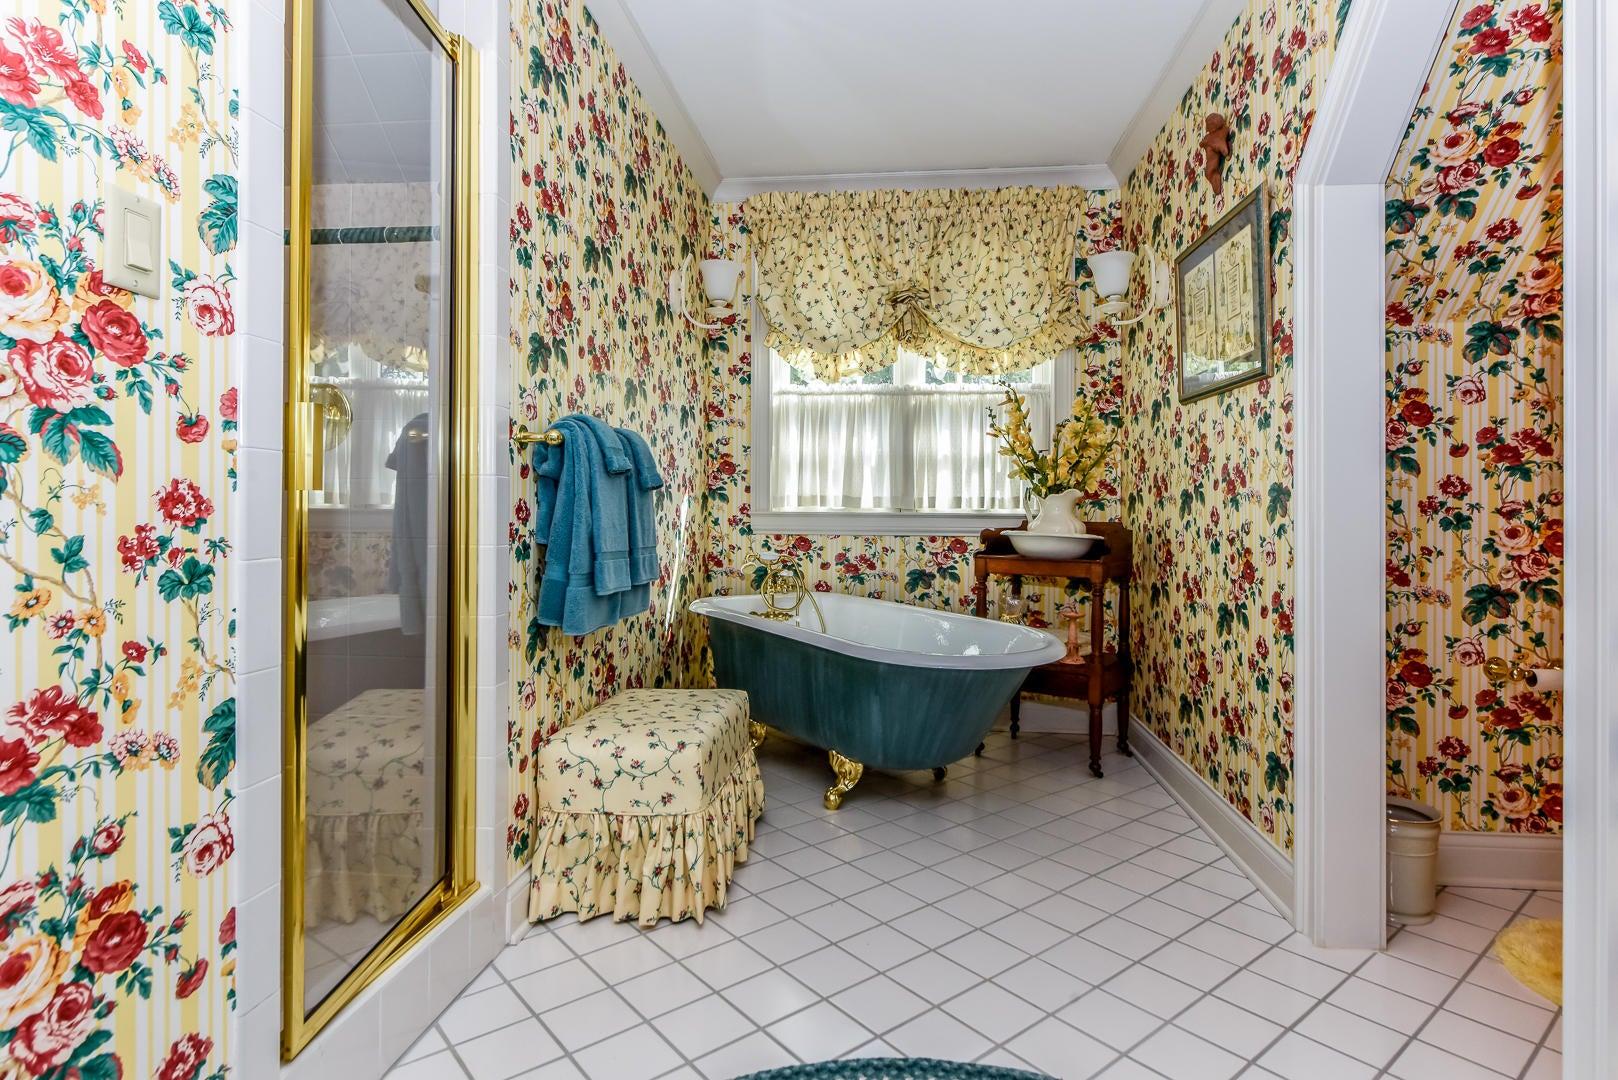 Second bath off bedroom upstairs